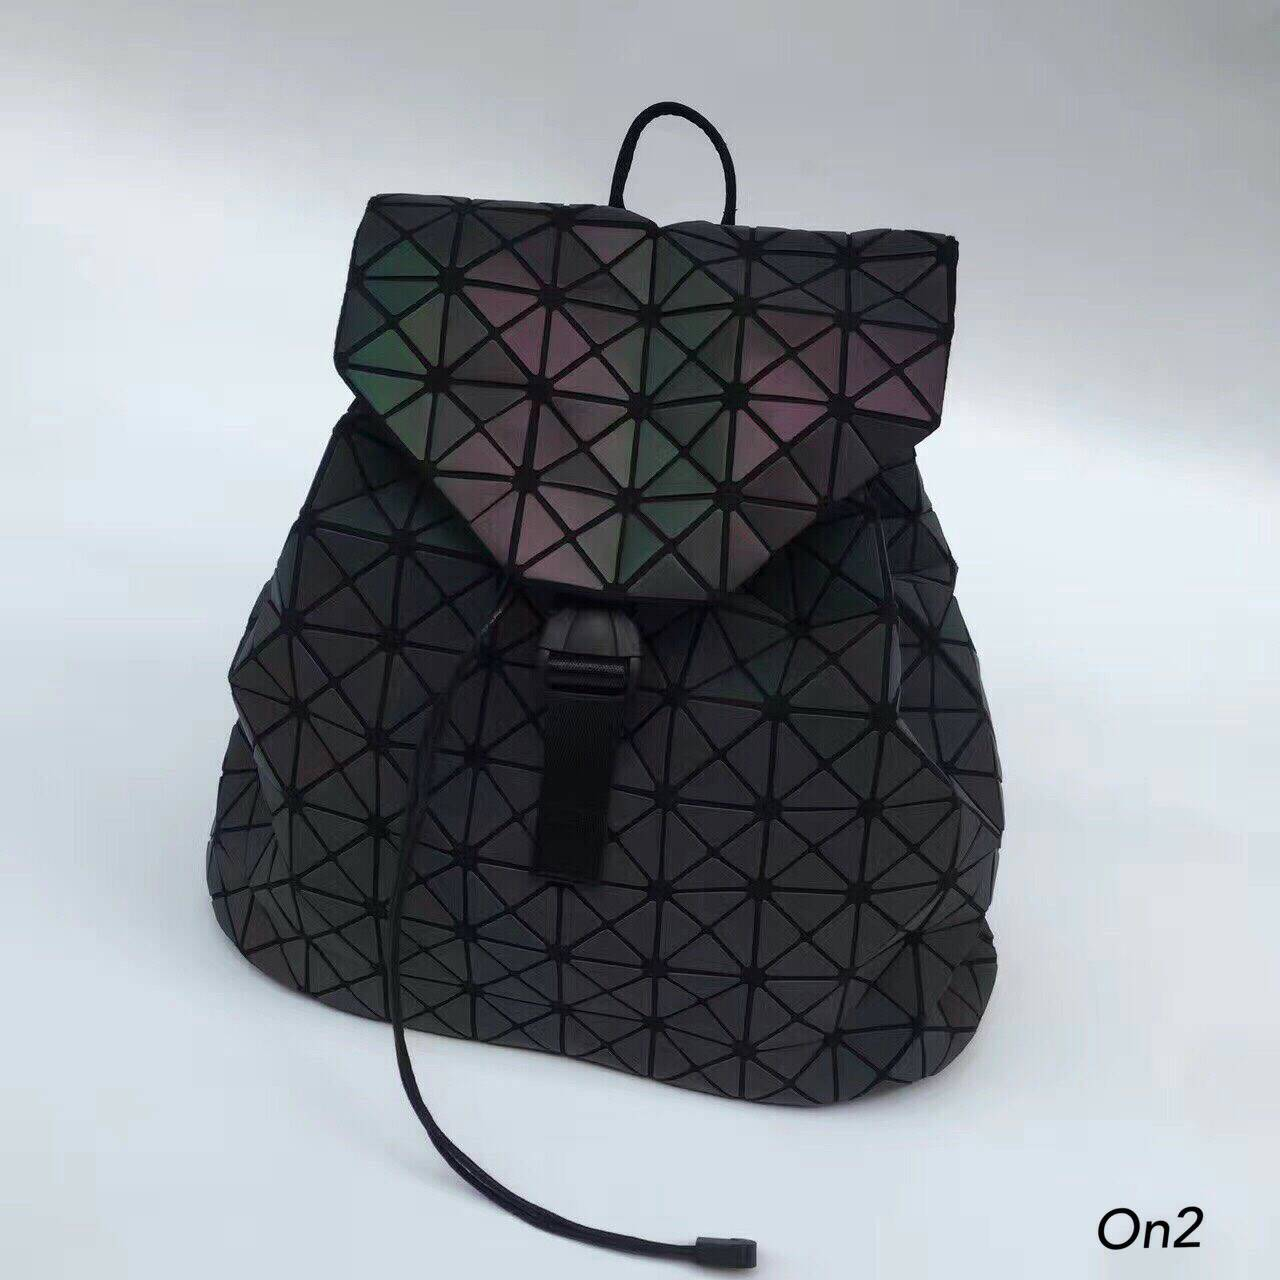 Issey Miyake Backpack แบบใหม่ก็มาคร่าาาGLOW IN THE DARK